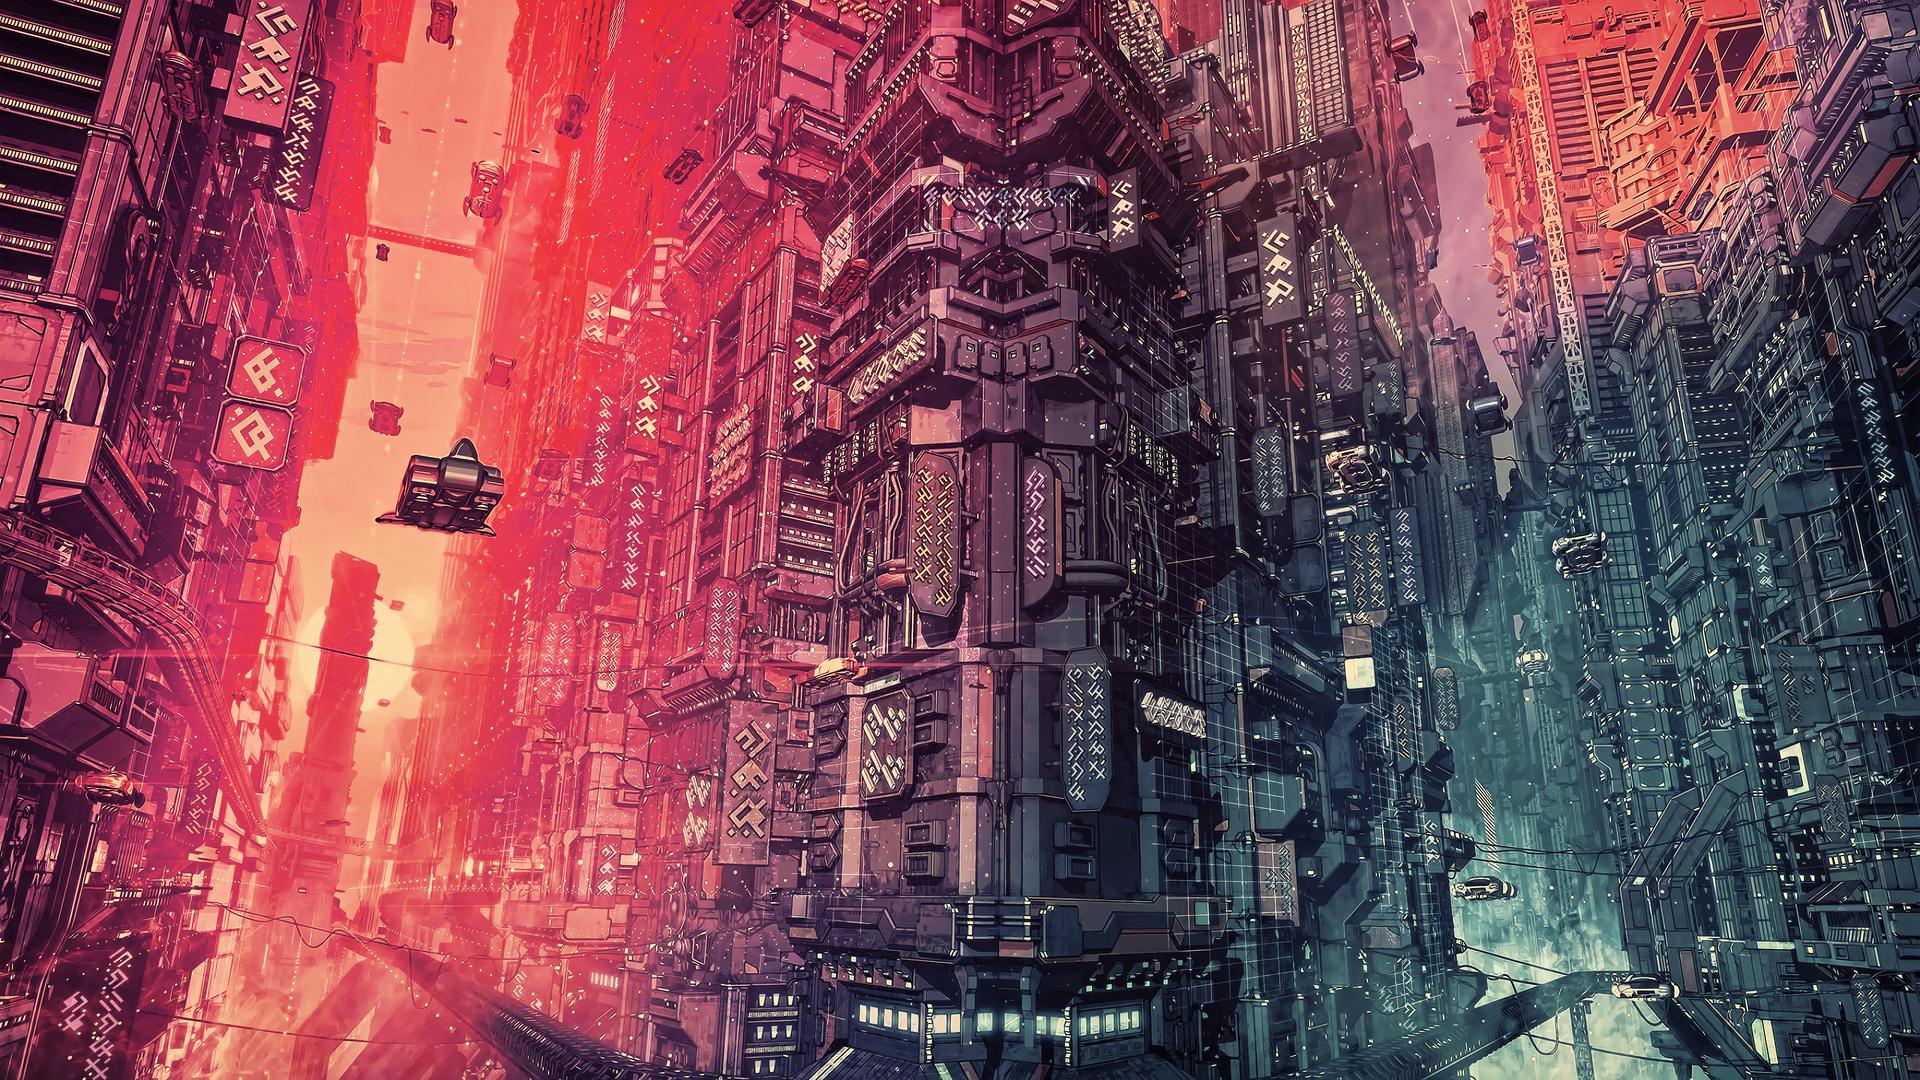 1920x1080 Cyber Futuristic City Fantasy Art 4k Laptop Full ...